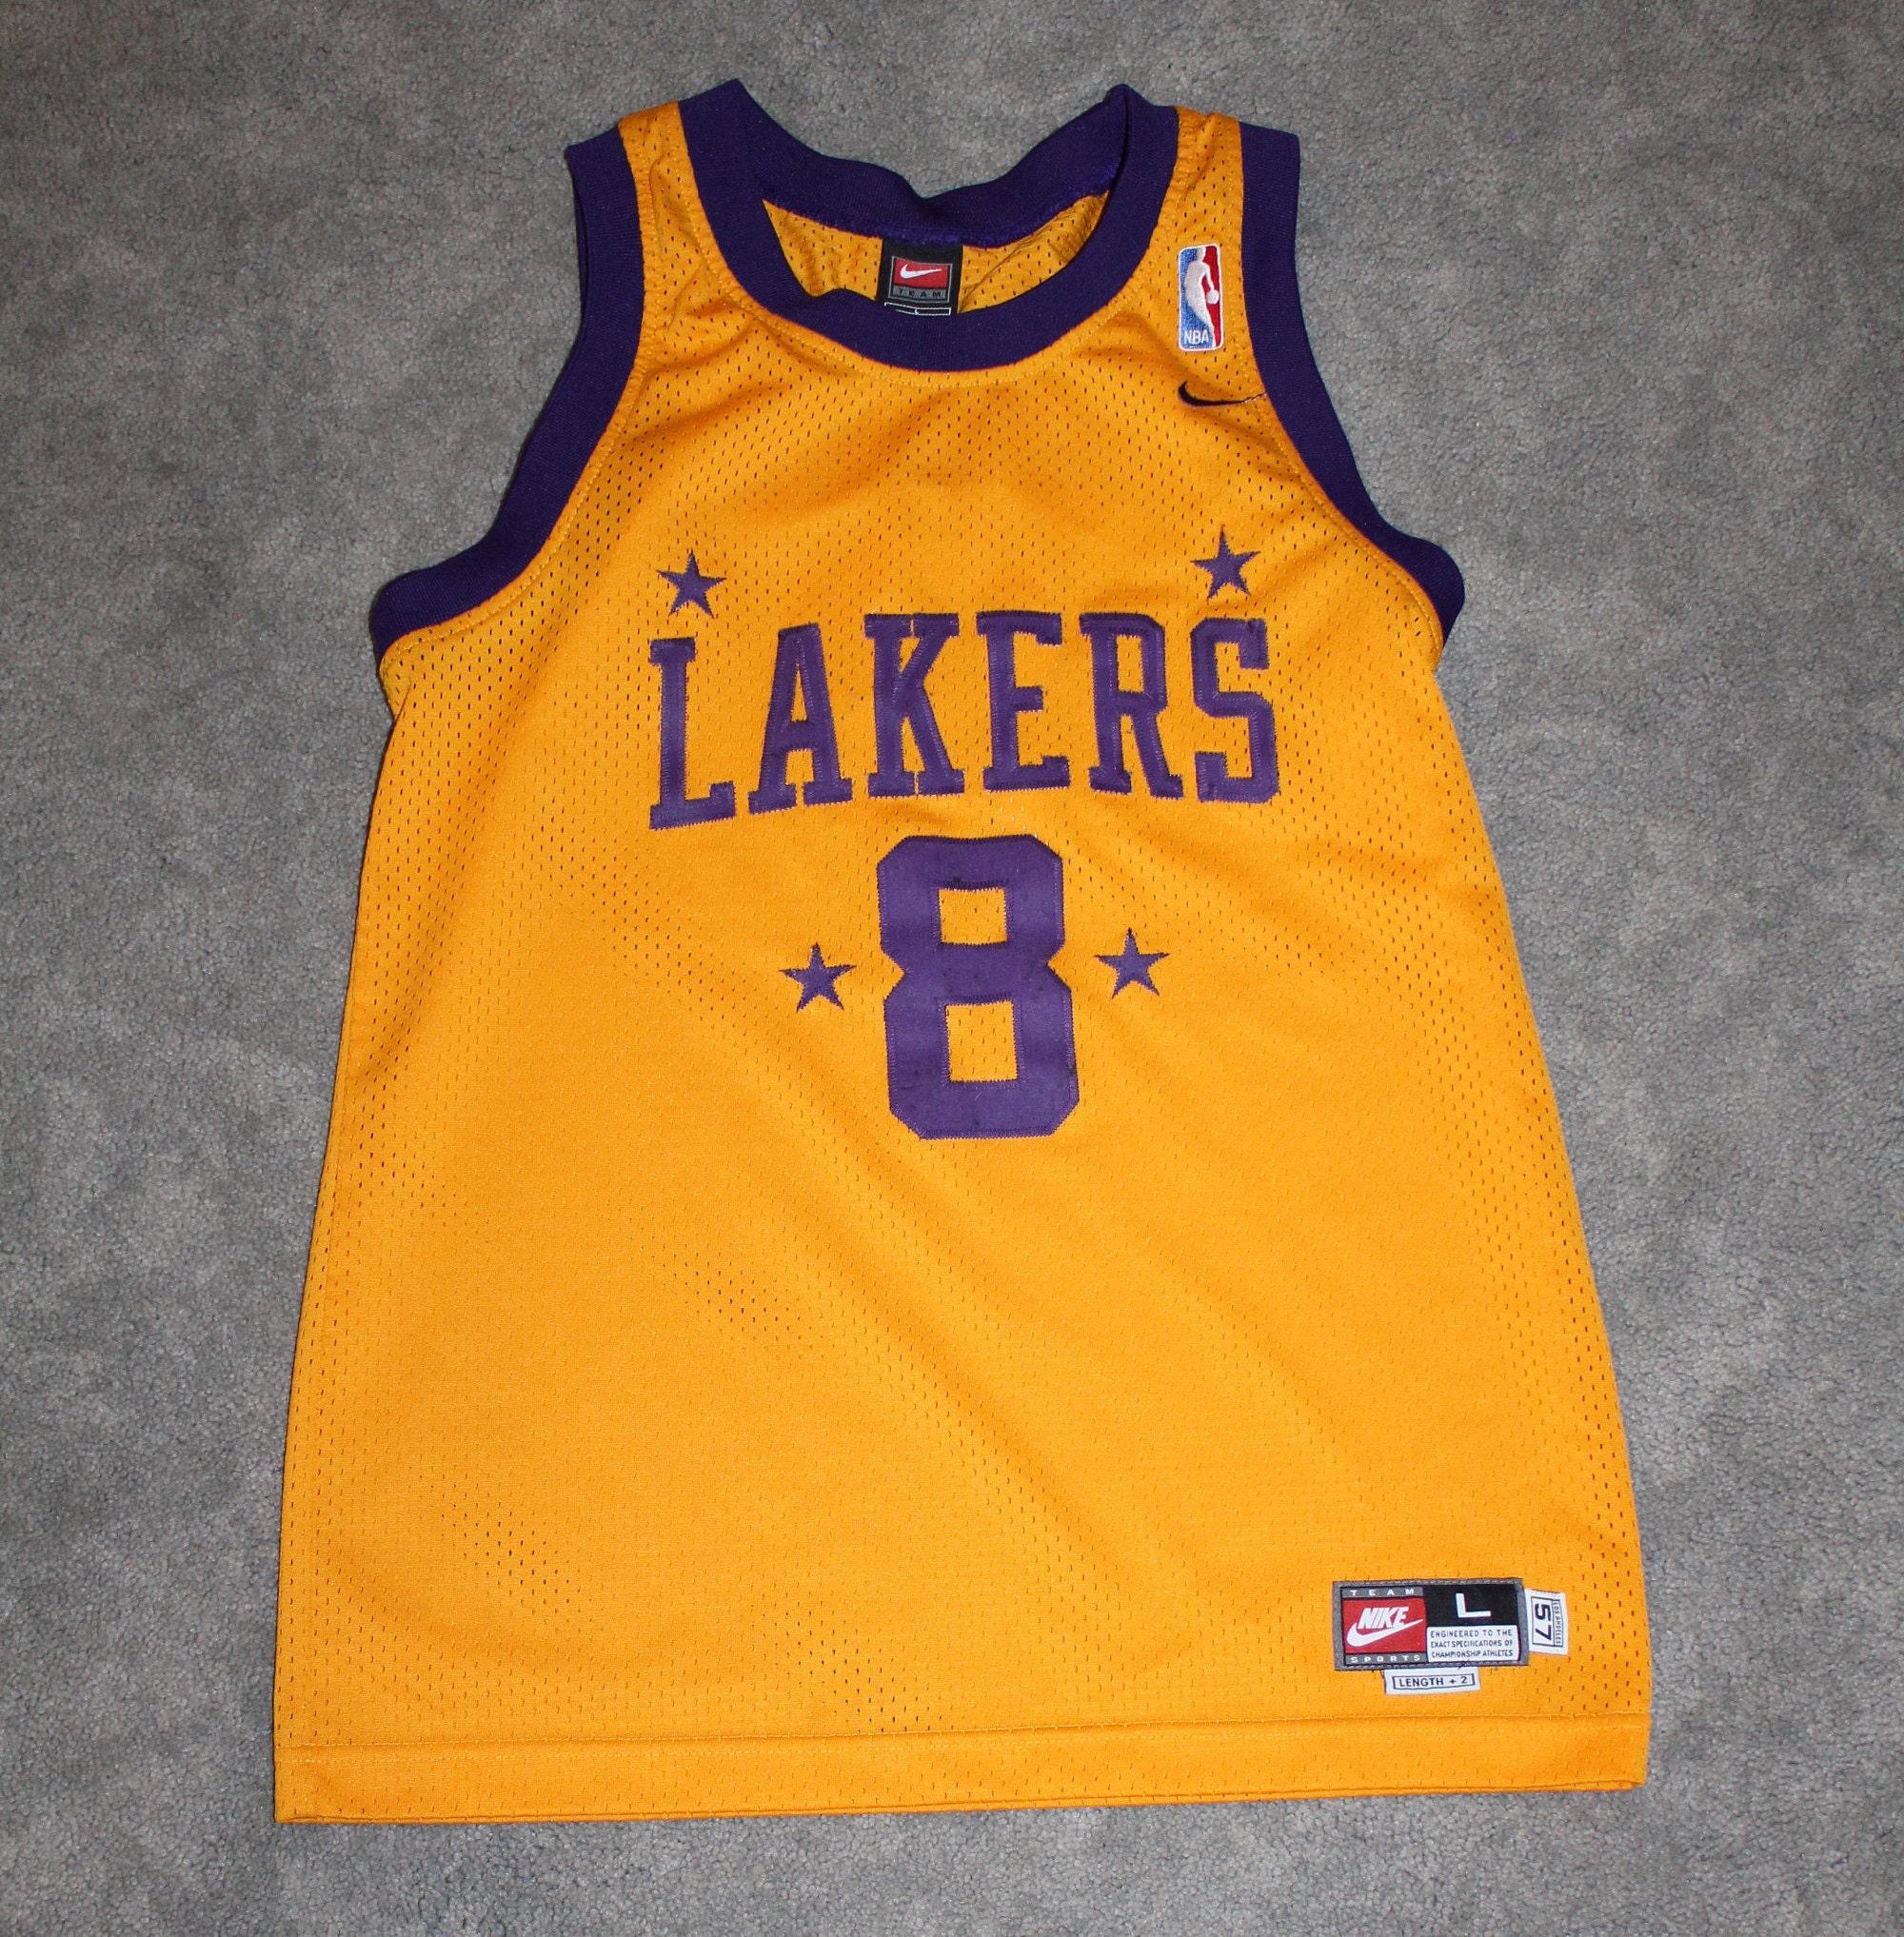 294f983bfd1 Vintage 90s Clothing NBA Los Angeles Lakers Basketball Kobe | Etsy